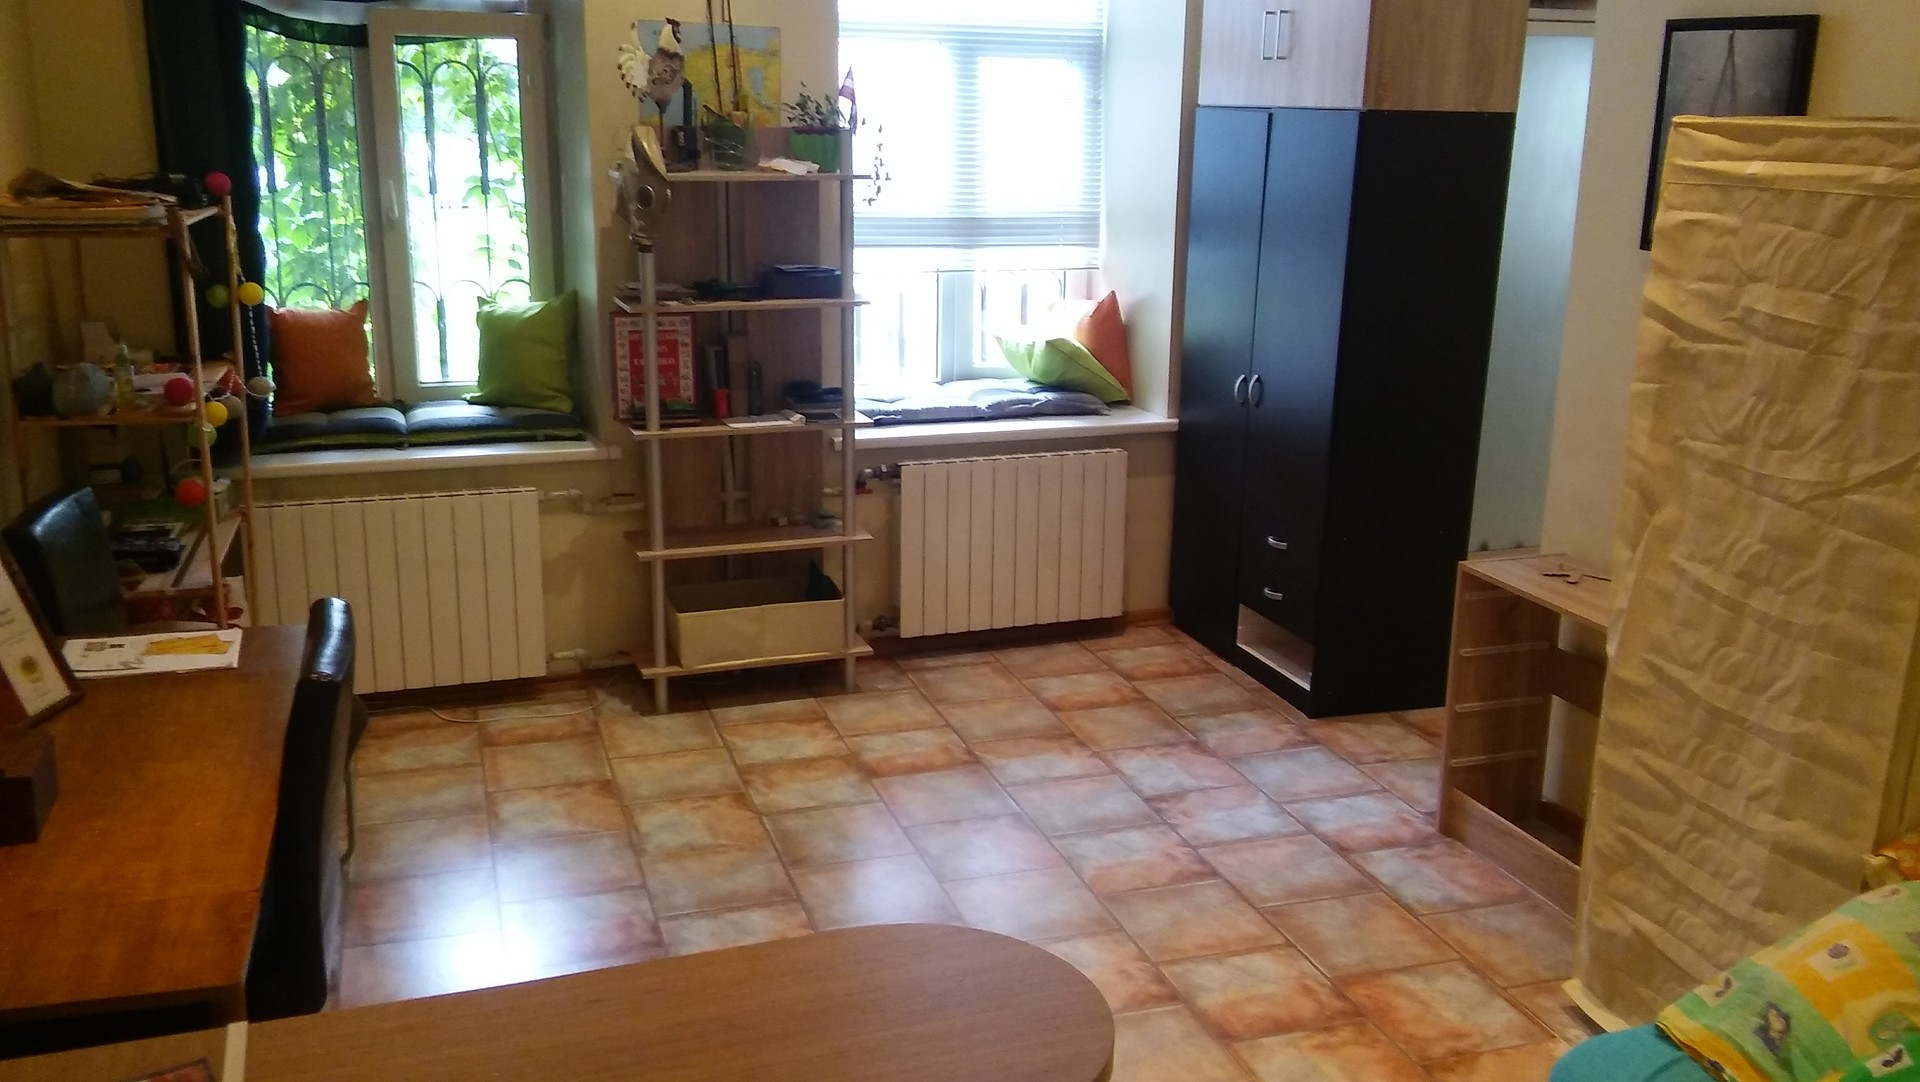 cosy-fully-renovated-flat-centre-riga-available-01092016-9ba38603bd23409759ab33417254650a